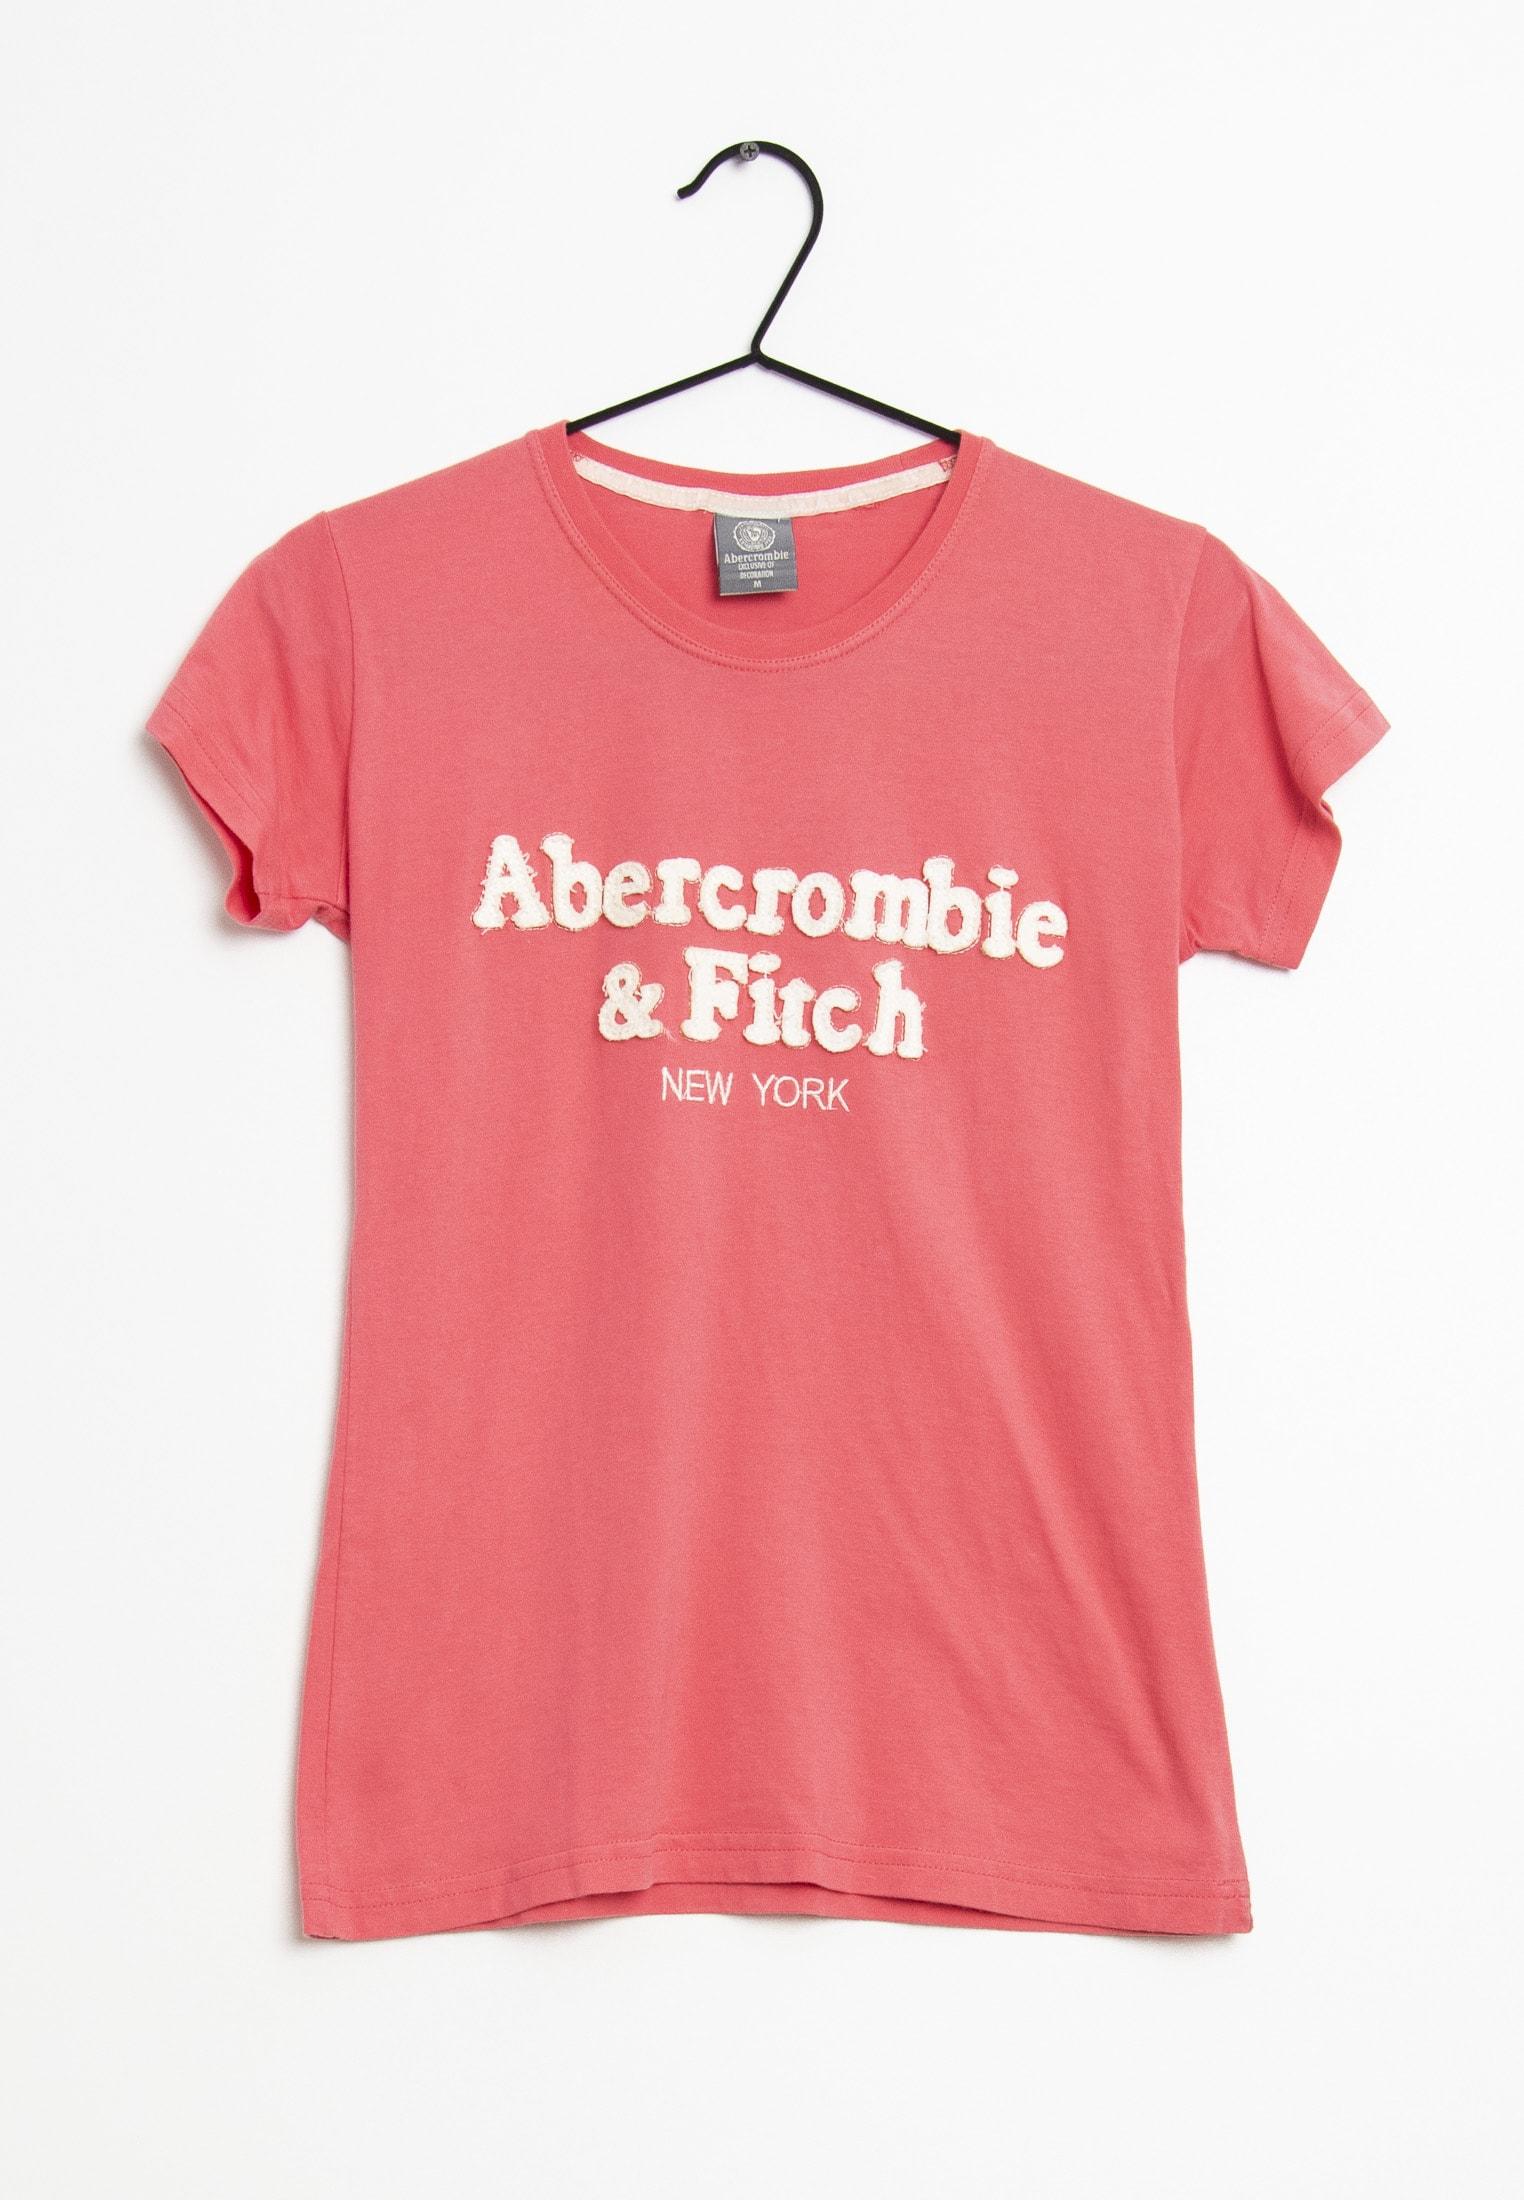 Abercrombie & Fitch T-Shirt Blau Gr.M